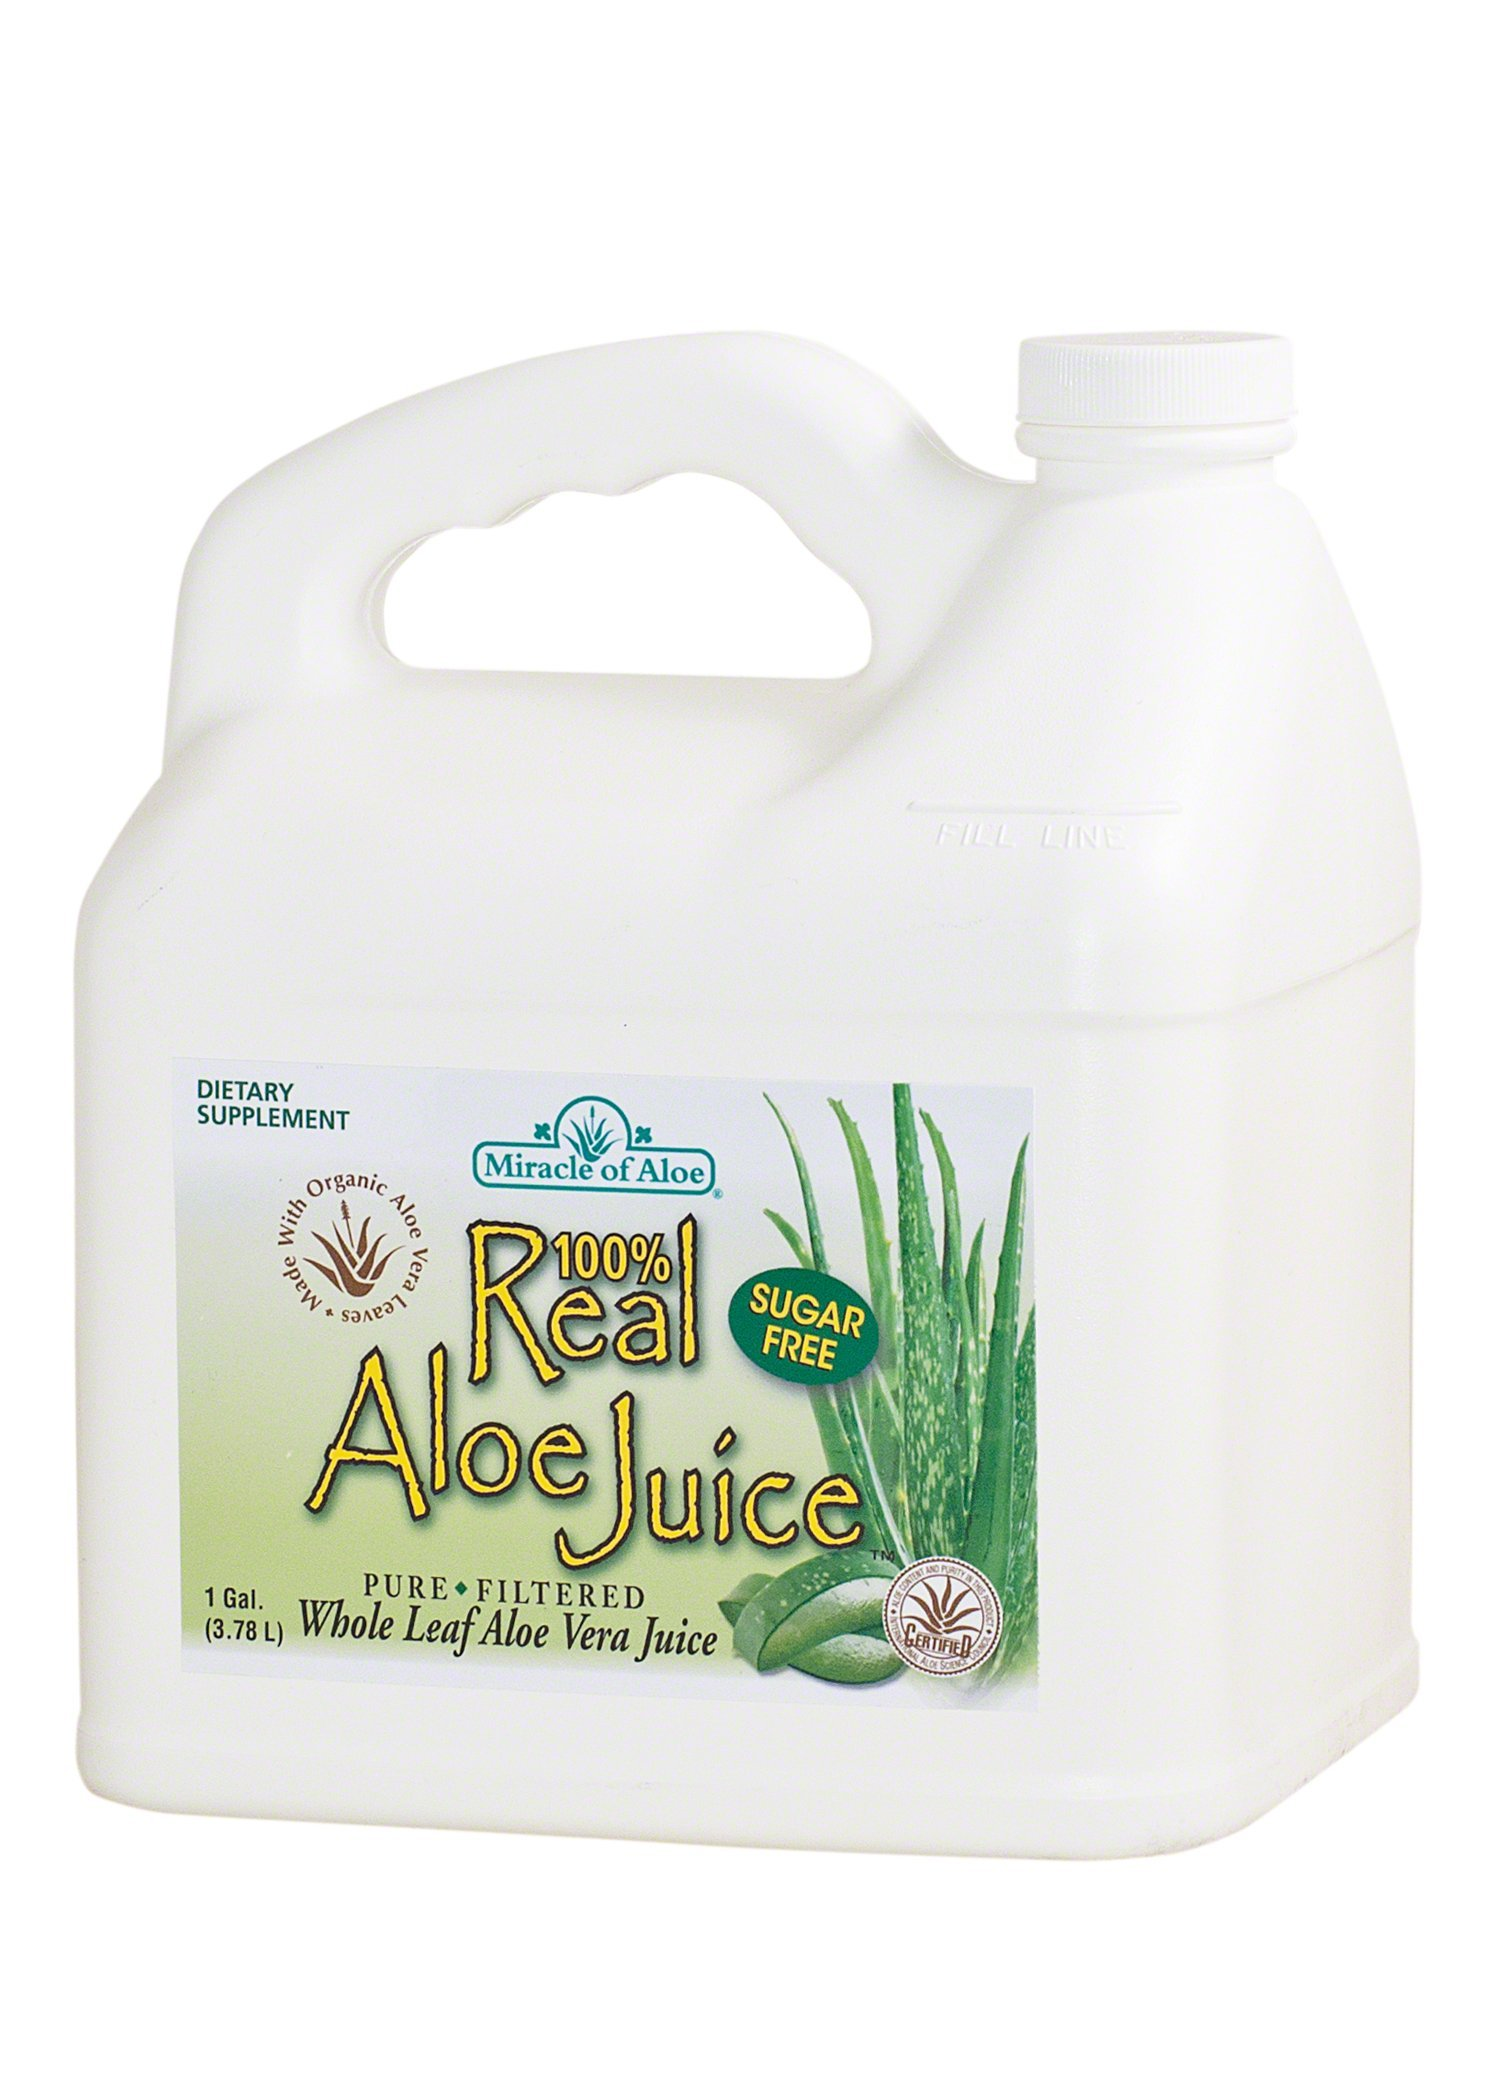 Real Aloe Whole-Leaf Pure Aloe Vera Juice - Made from Organically Grown Aloe Vera Leaves Purified & Filtered (1 Gallon)